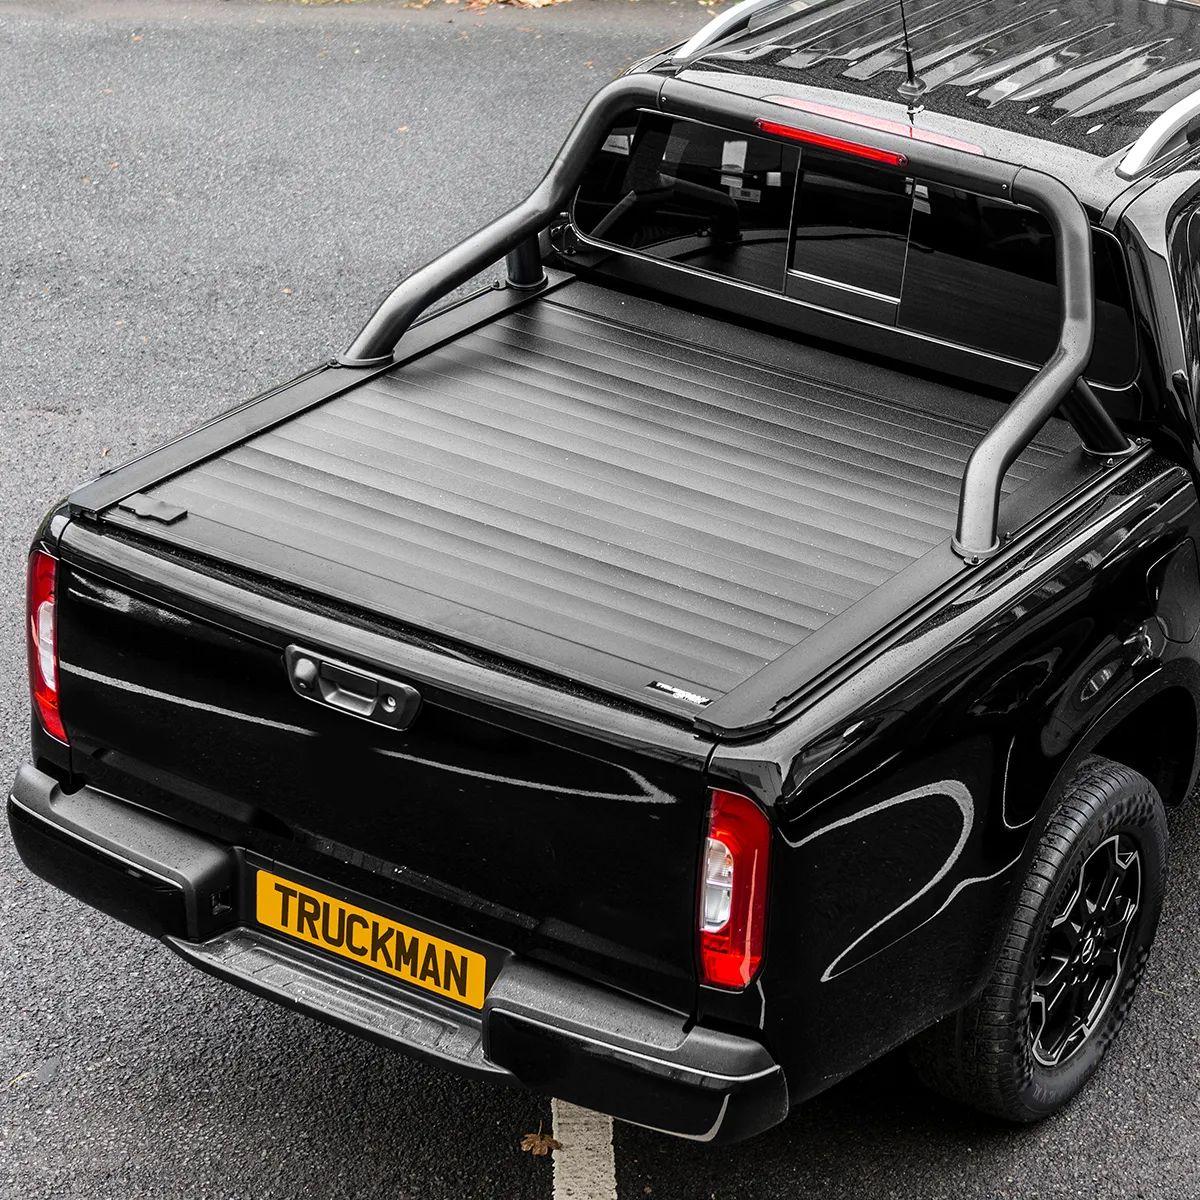 truckman retrax roller shutter tonneau cover black roll bar ford ranger 2012 onwards double cab